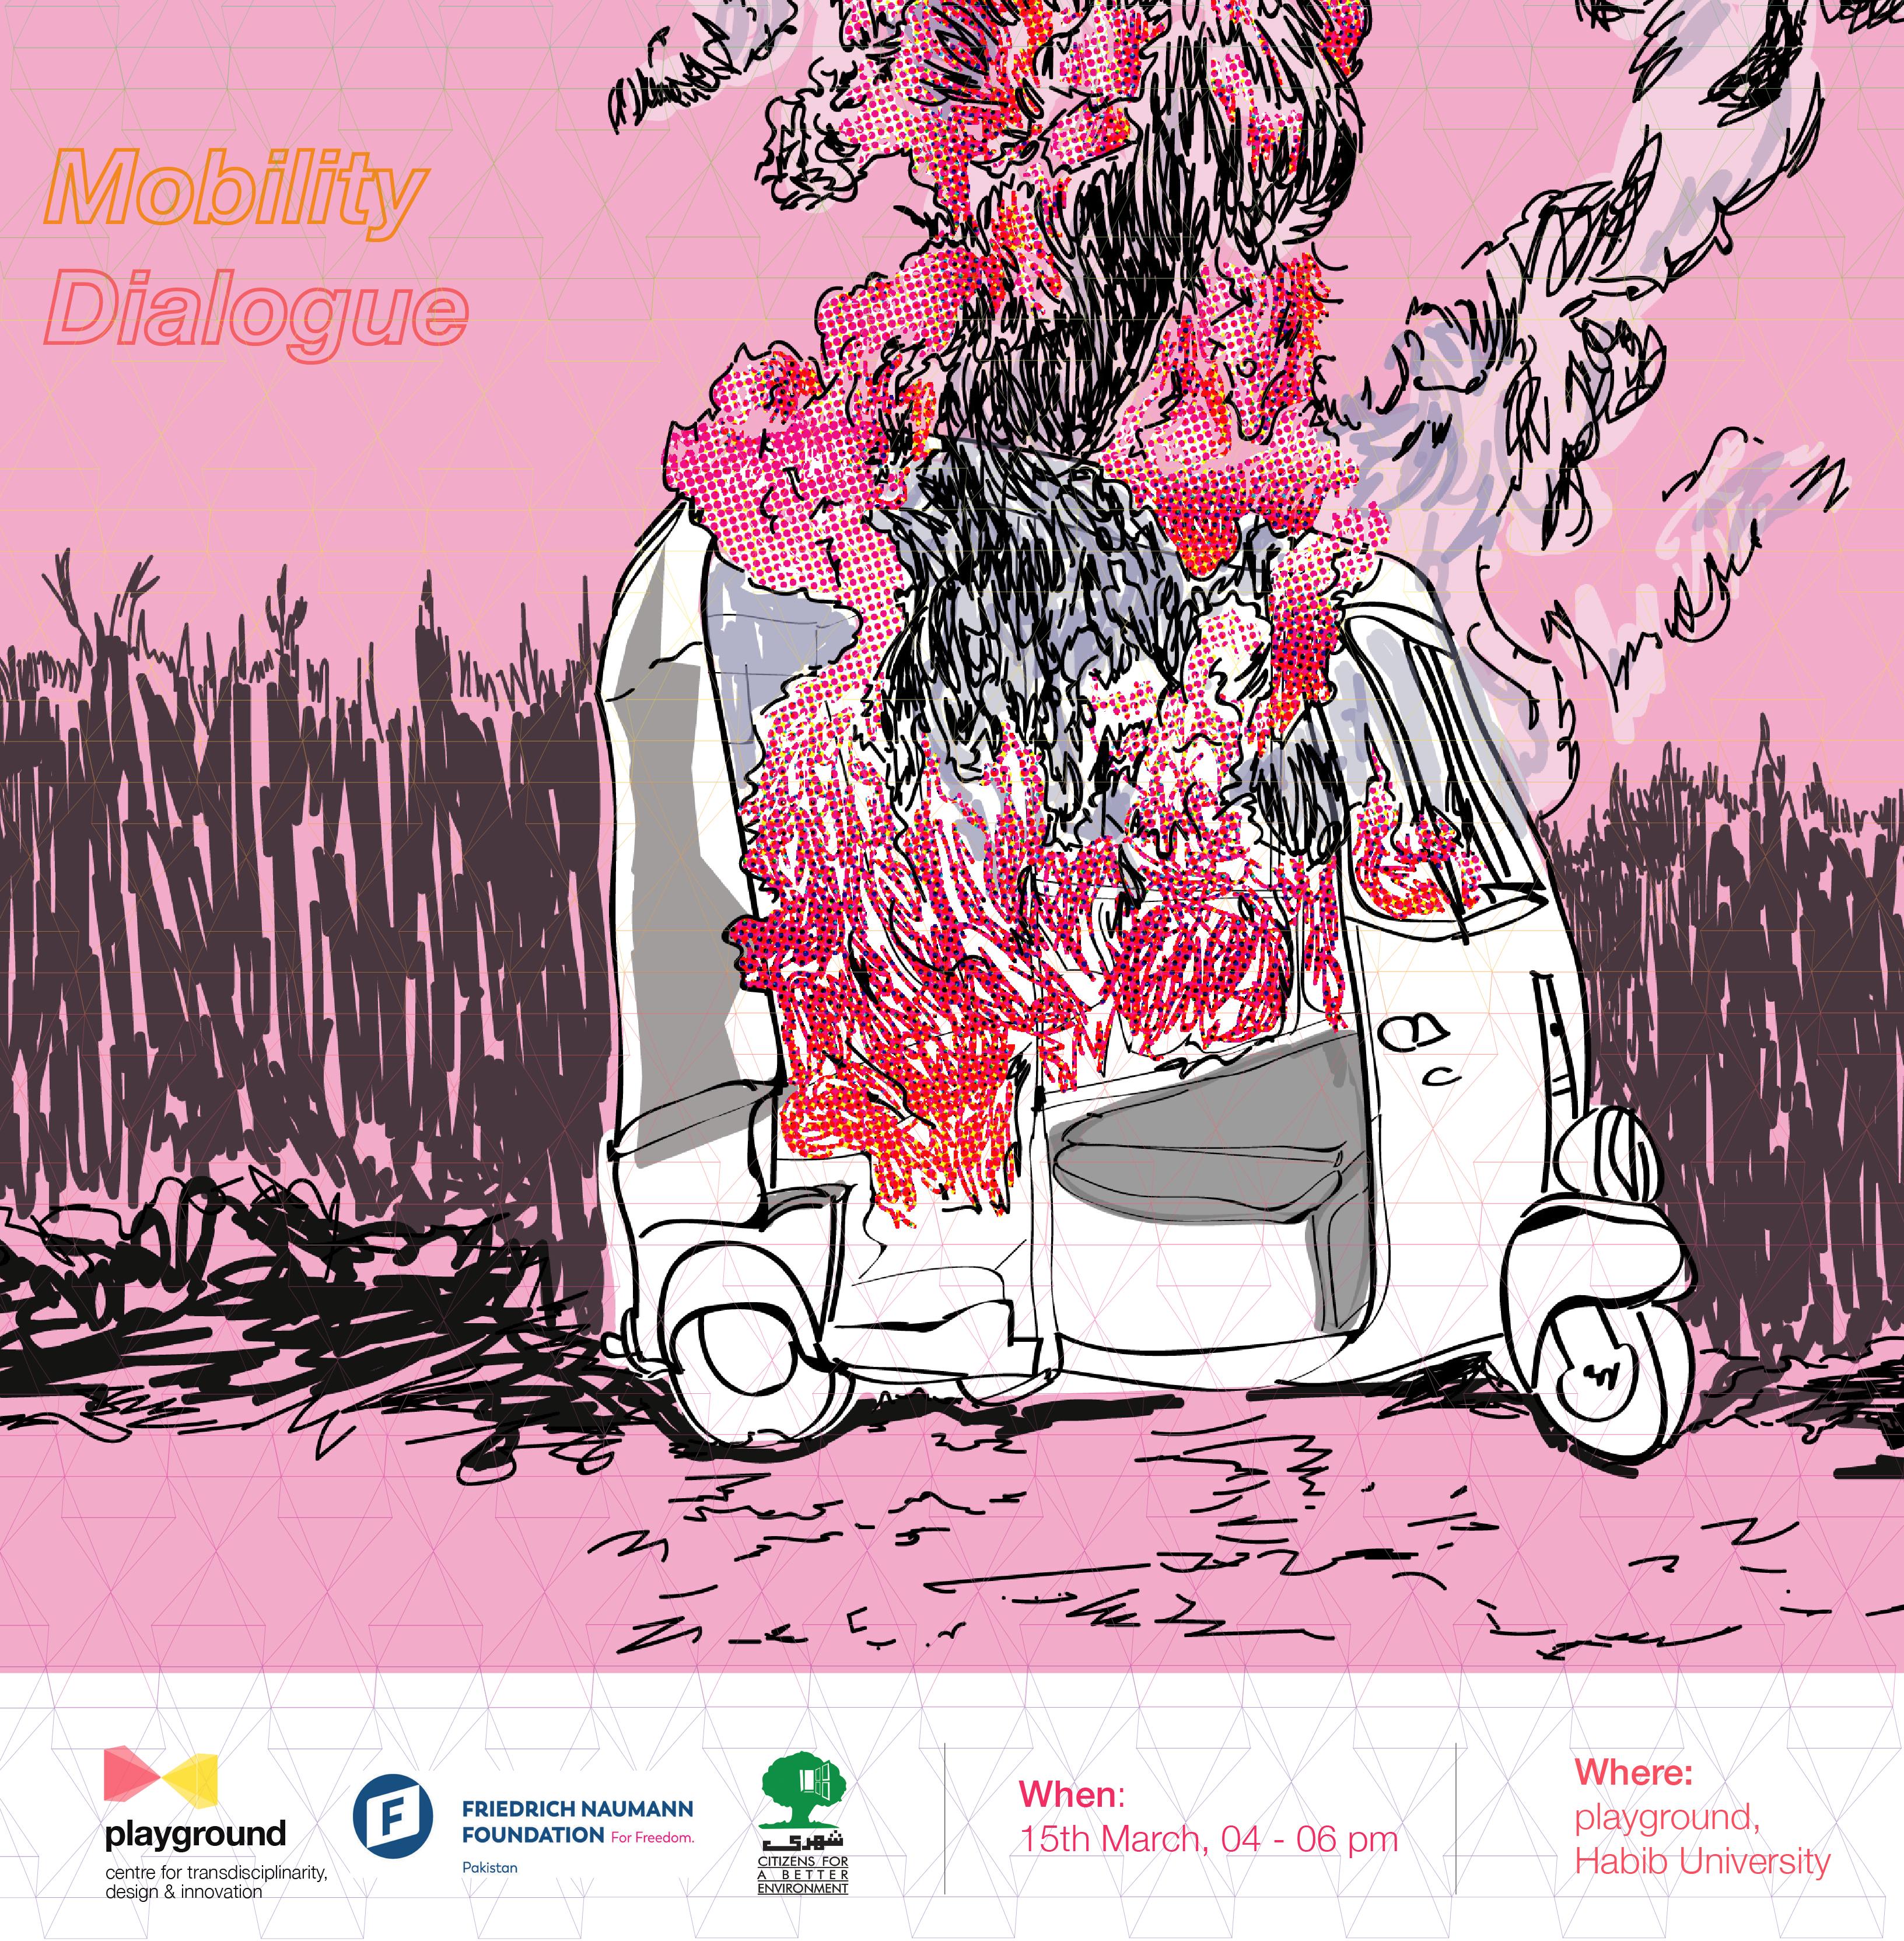 Mobility Dialogue